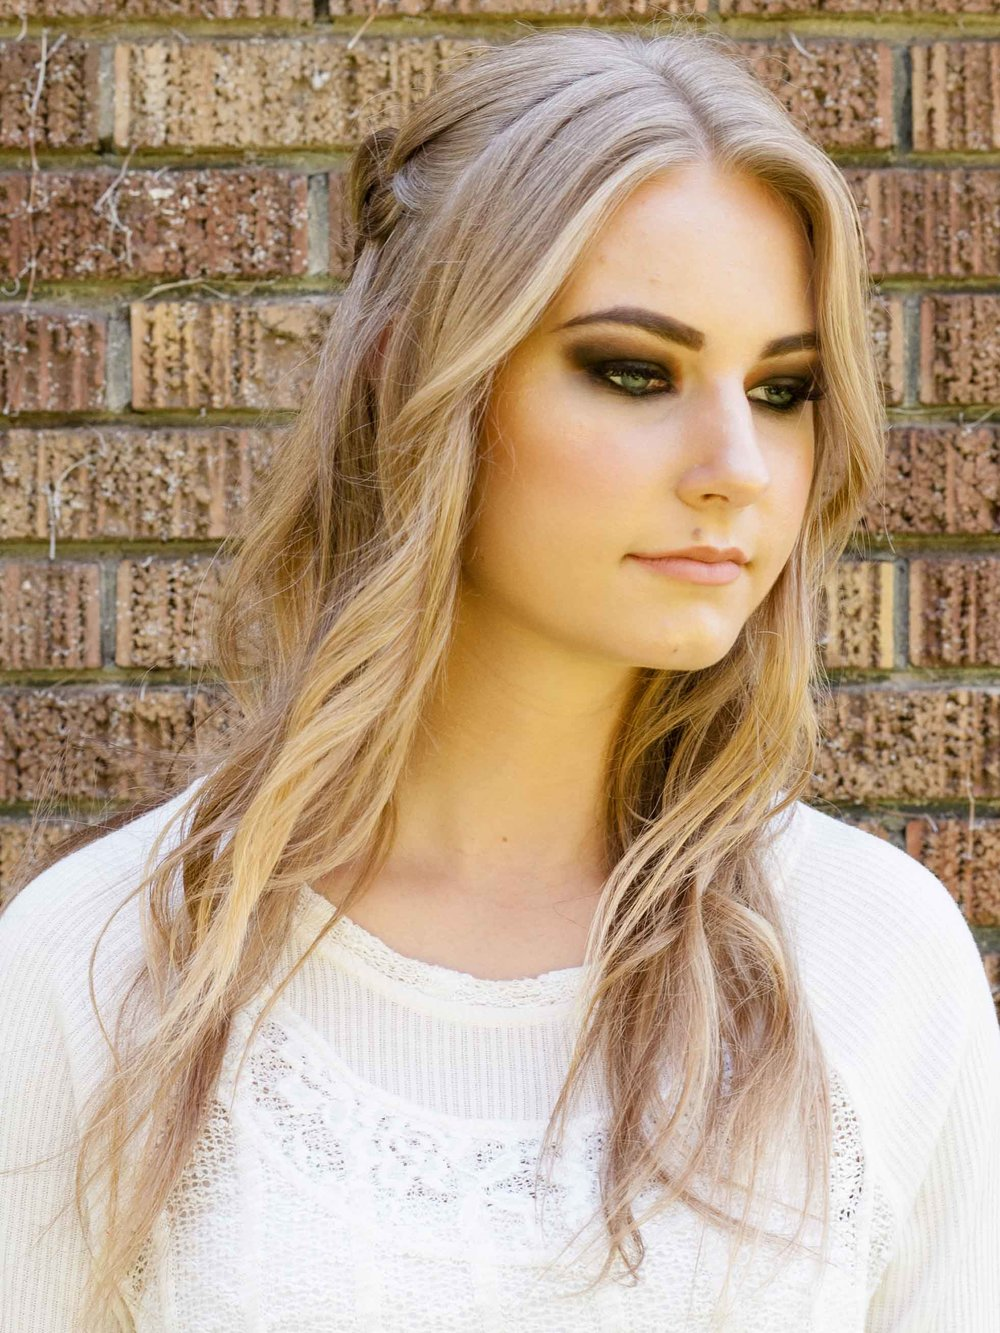 talia-whatcott-makeup-artist-portfolio-blog-hair-waterfall-braid-smoky-eye-matte-lip-bridal-wedding-tousled-curls-1-19.jpg